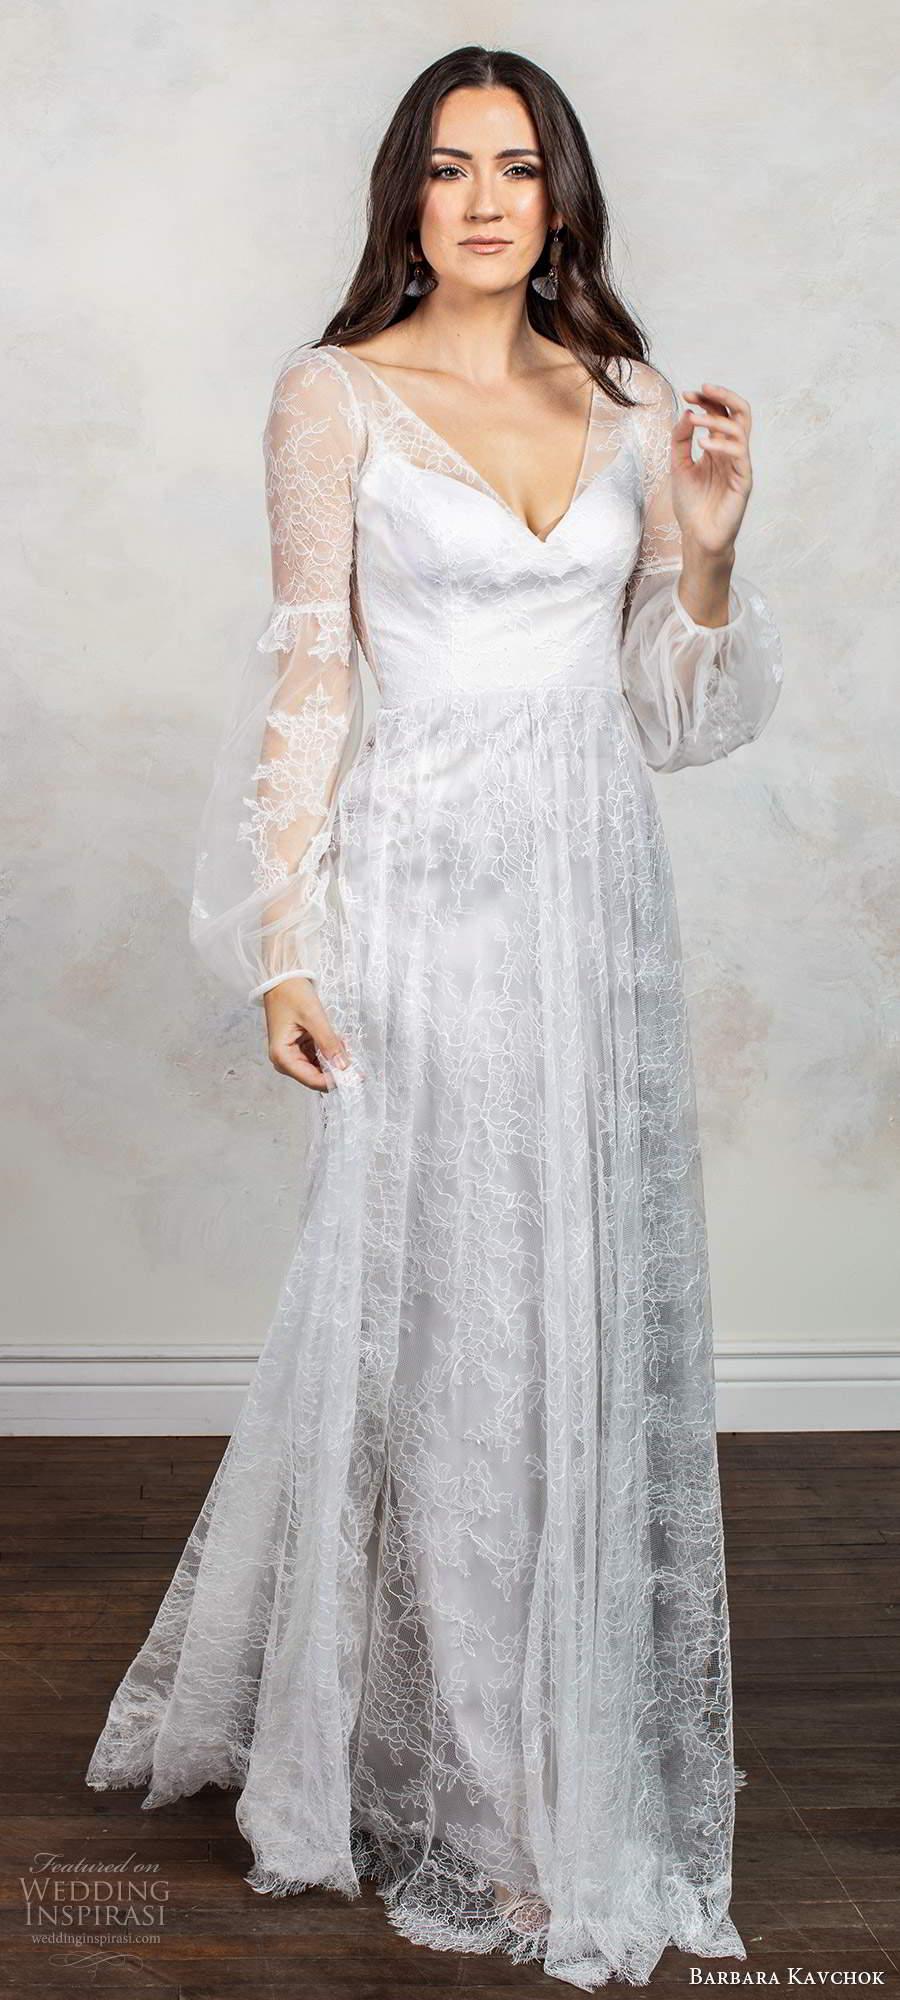 barbara kavchok fall 2020 bridal illusion long poet sleeves v neckline embellished lace bodice a line ball gown wedding dress keyhole back chapel train (10) mv